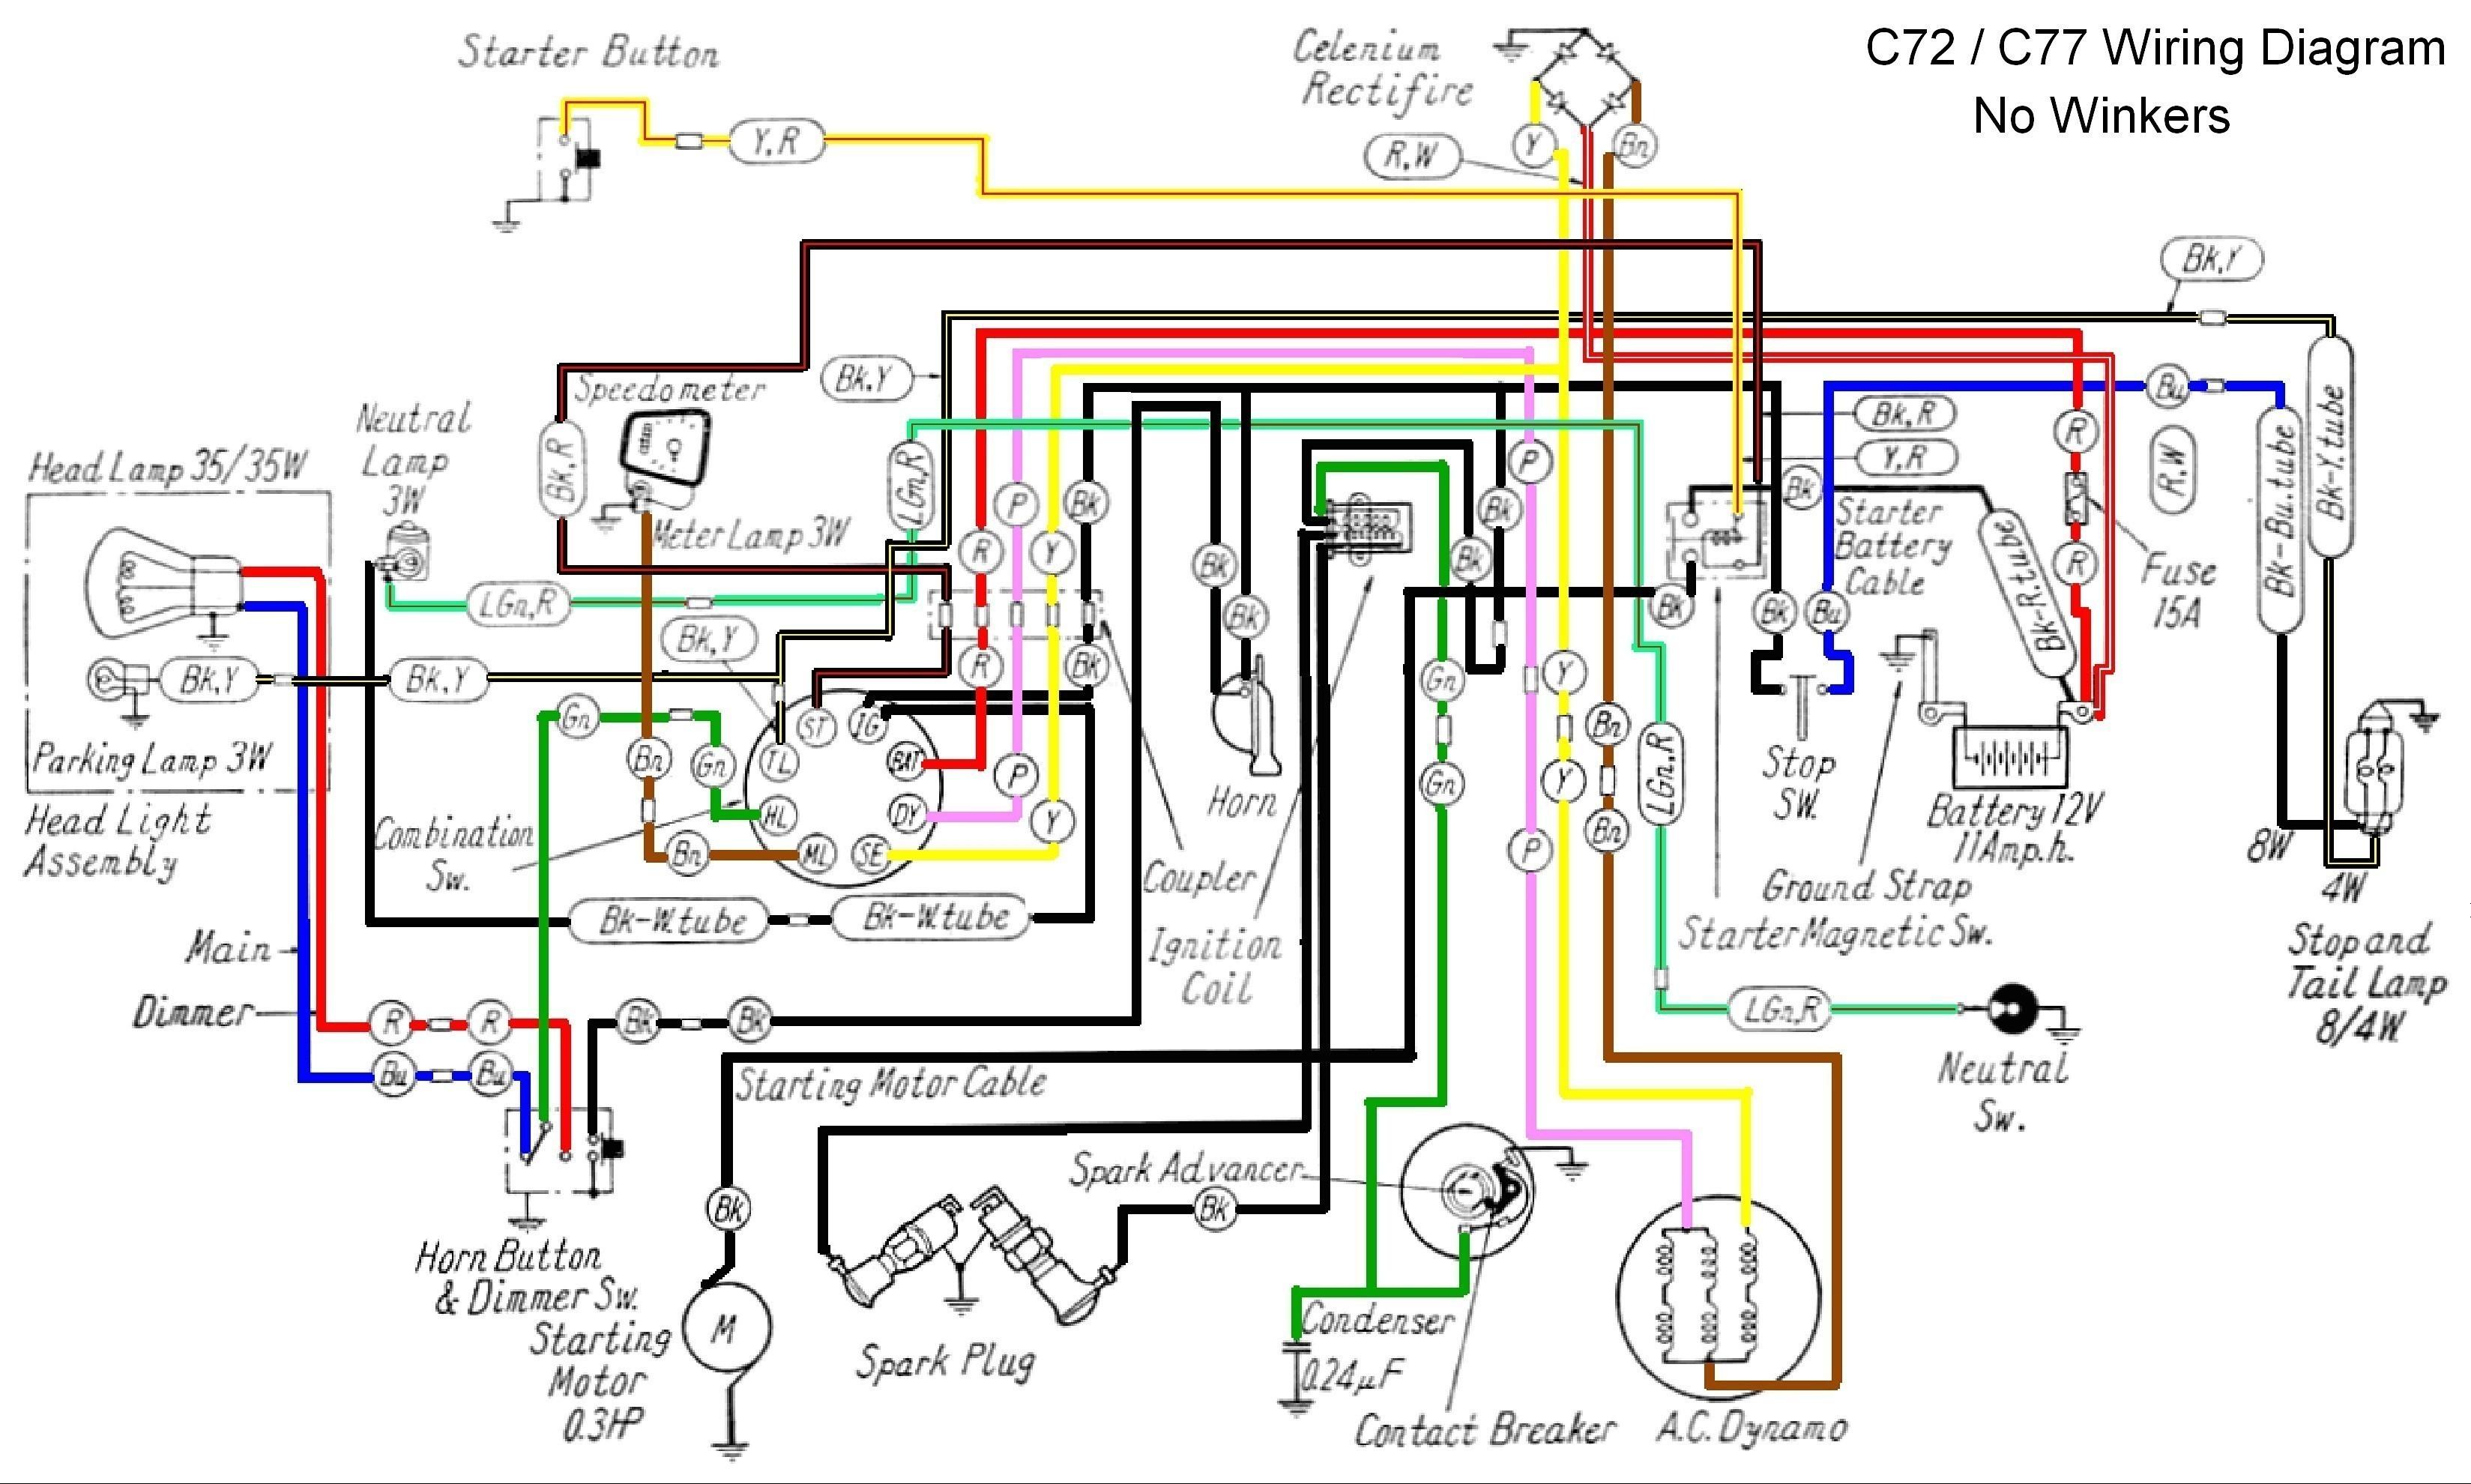 1987 Honda Accord Engine Diagram Honda A Wiring Diagram Wiring Diagram Datasource Of 1987 Honda Accord Engine Diagram